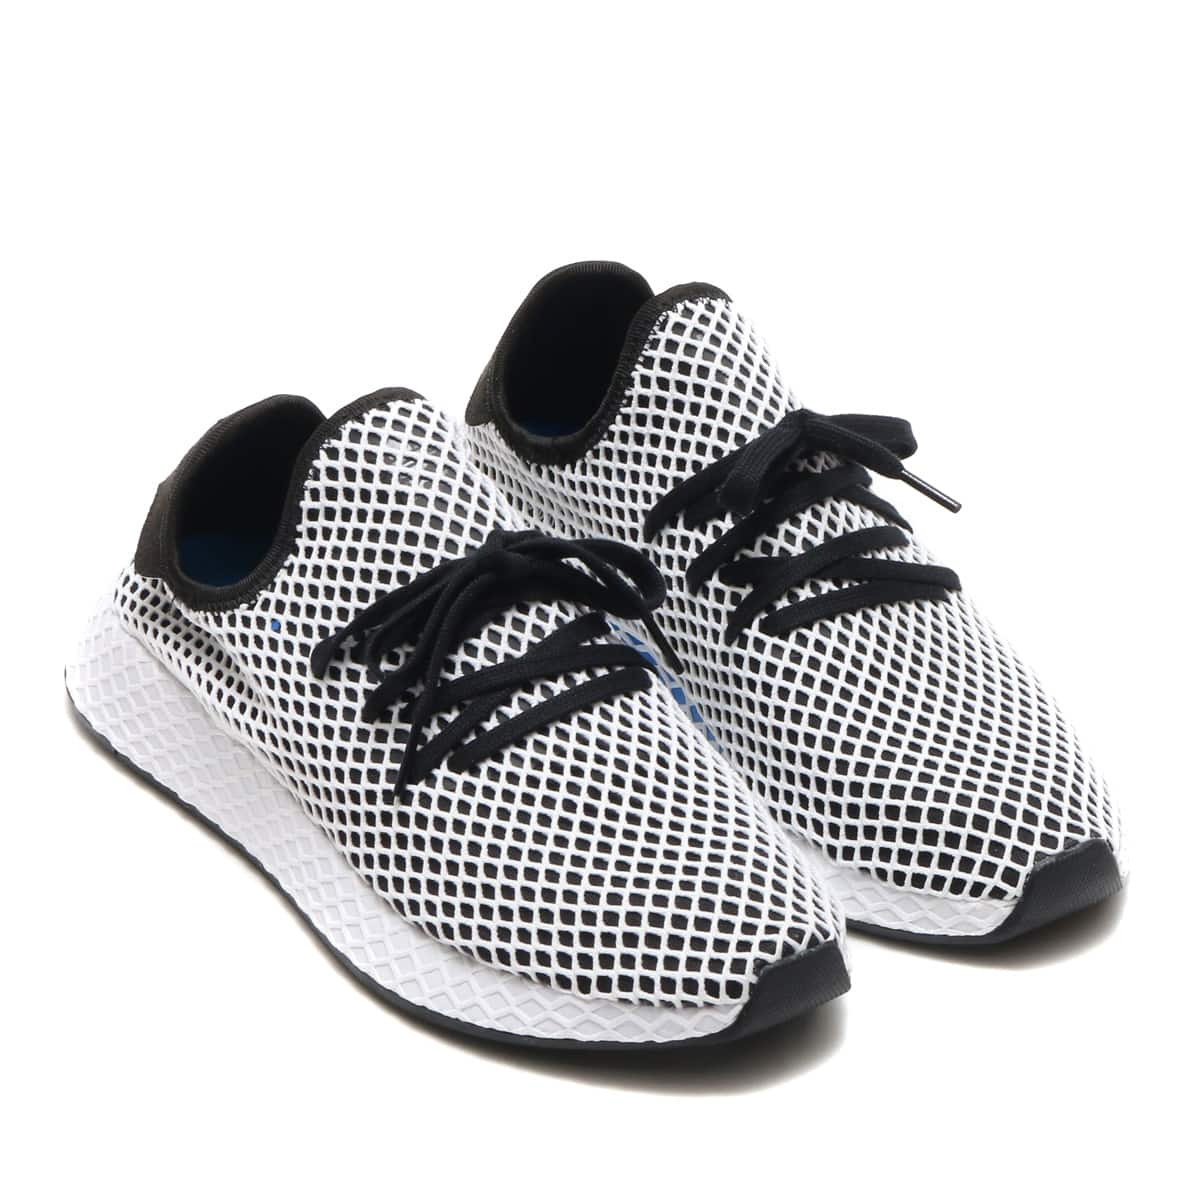 1ccaba403 adidas Originals DEERUPT RUNNER Core Black Core Black Running  White photo large